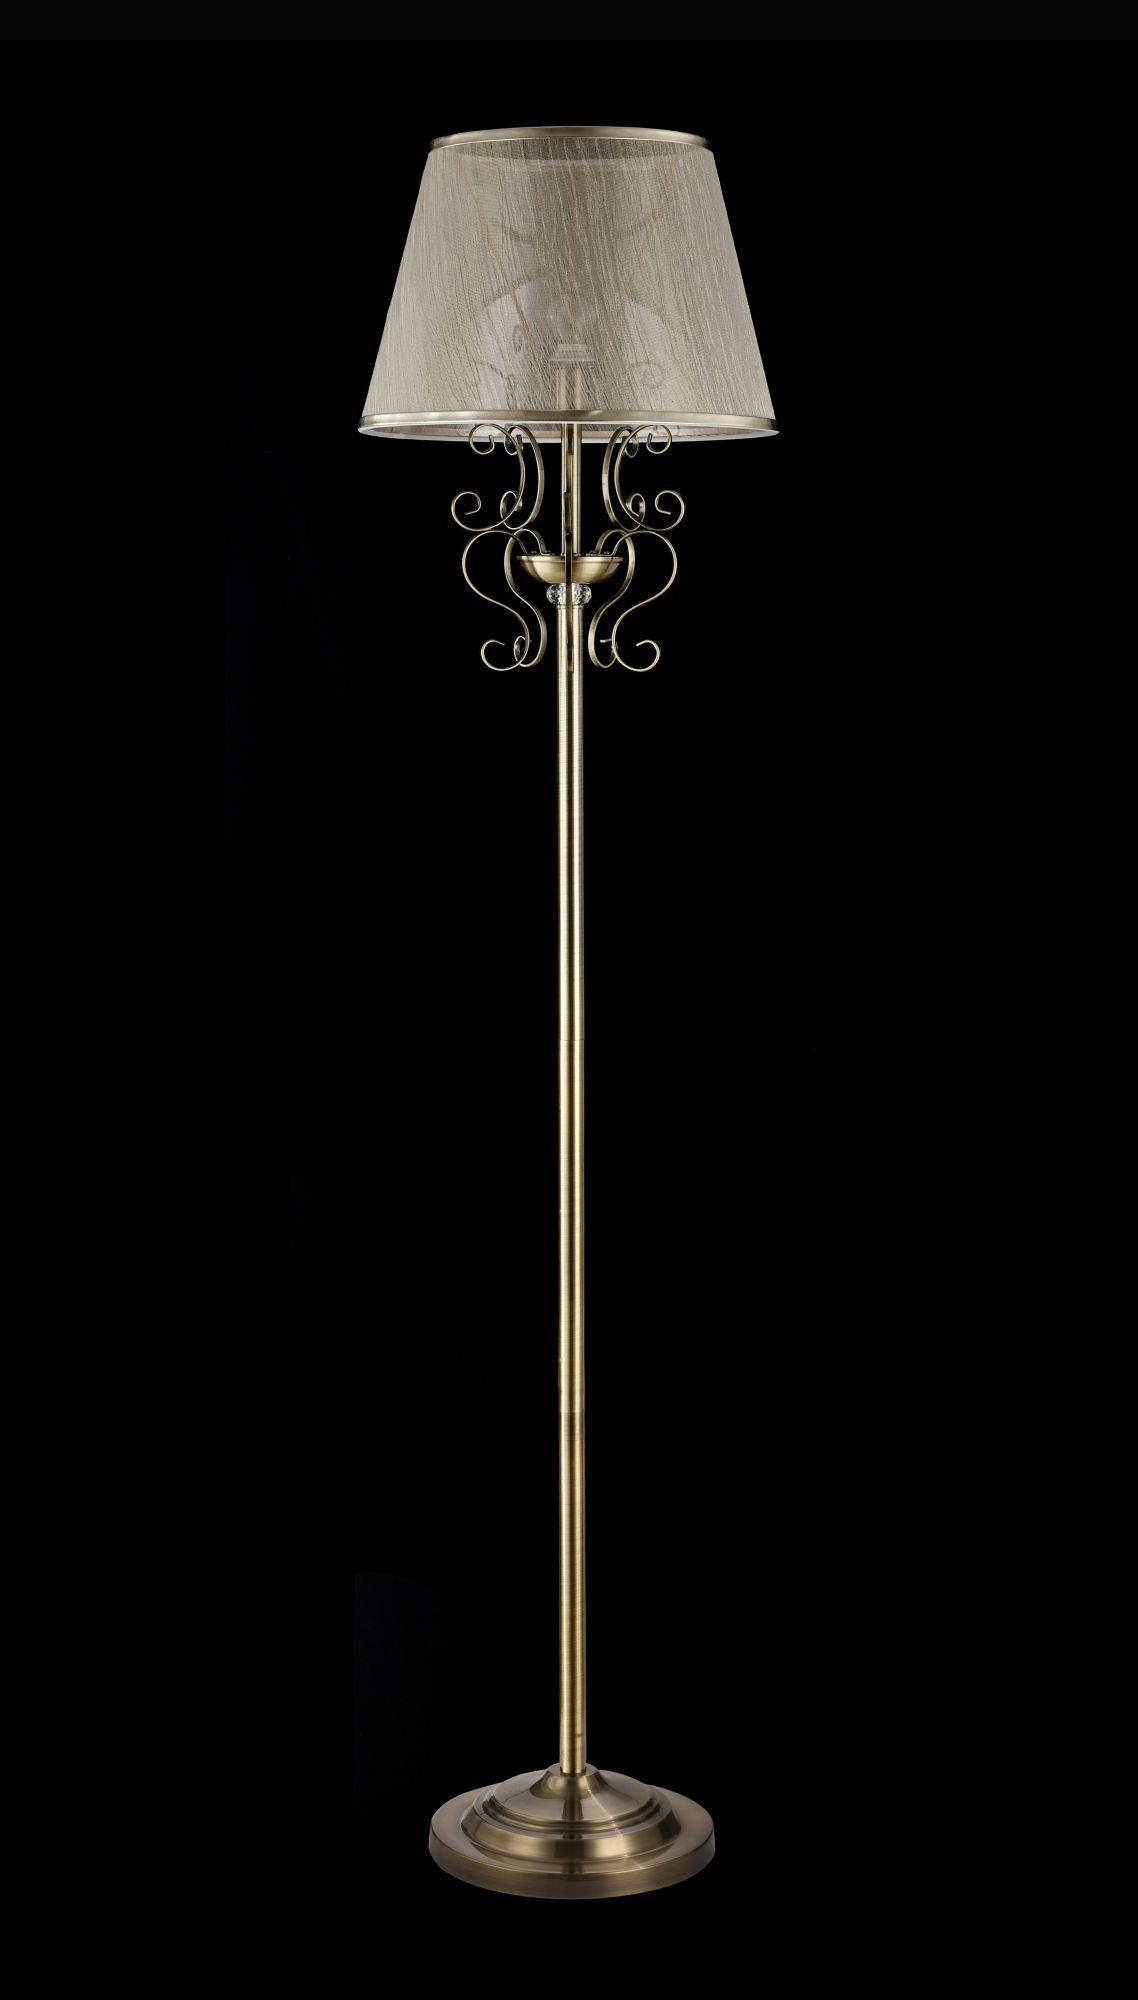 Торшер Freya Classic Driana FR2405-FL-01-BZ (FR405-001-R), 1xE14x40W, бронза с прозрачным, прозрачный с бронзой, металл с хрусталем, текстиль - фото 2